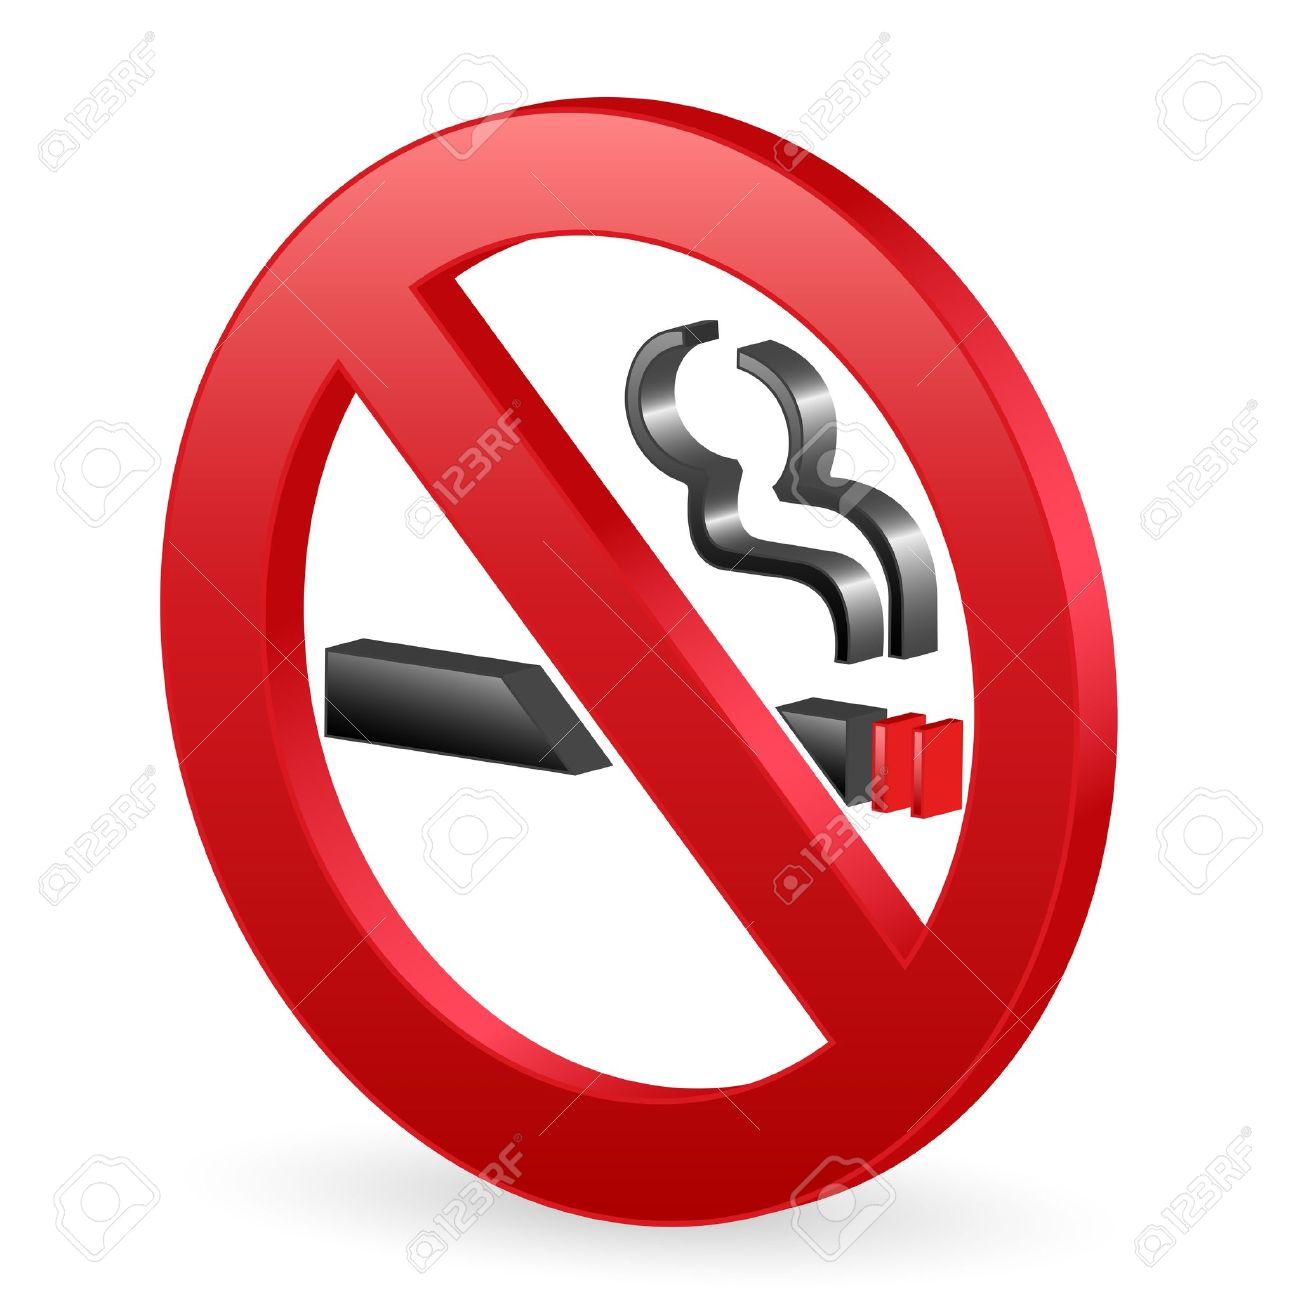 No smoking sign symbol tobacco stock photo picture and royalty no smoking sign symbol tobacco stock photo 4979109 biocorpaavc Image collections